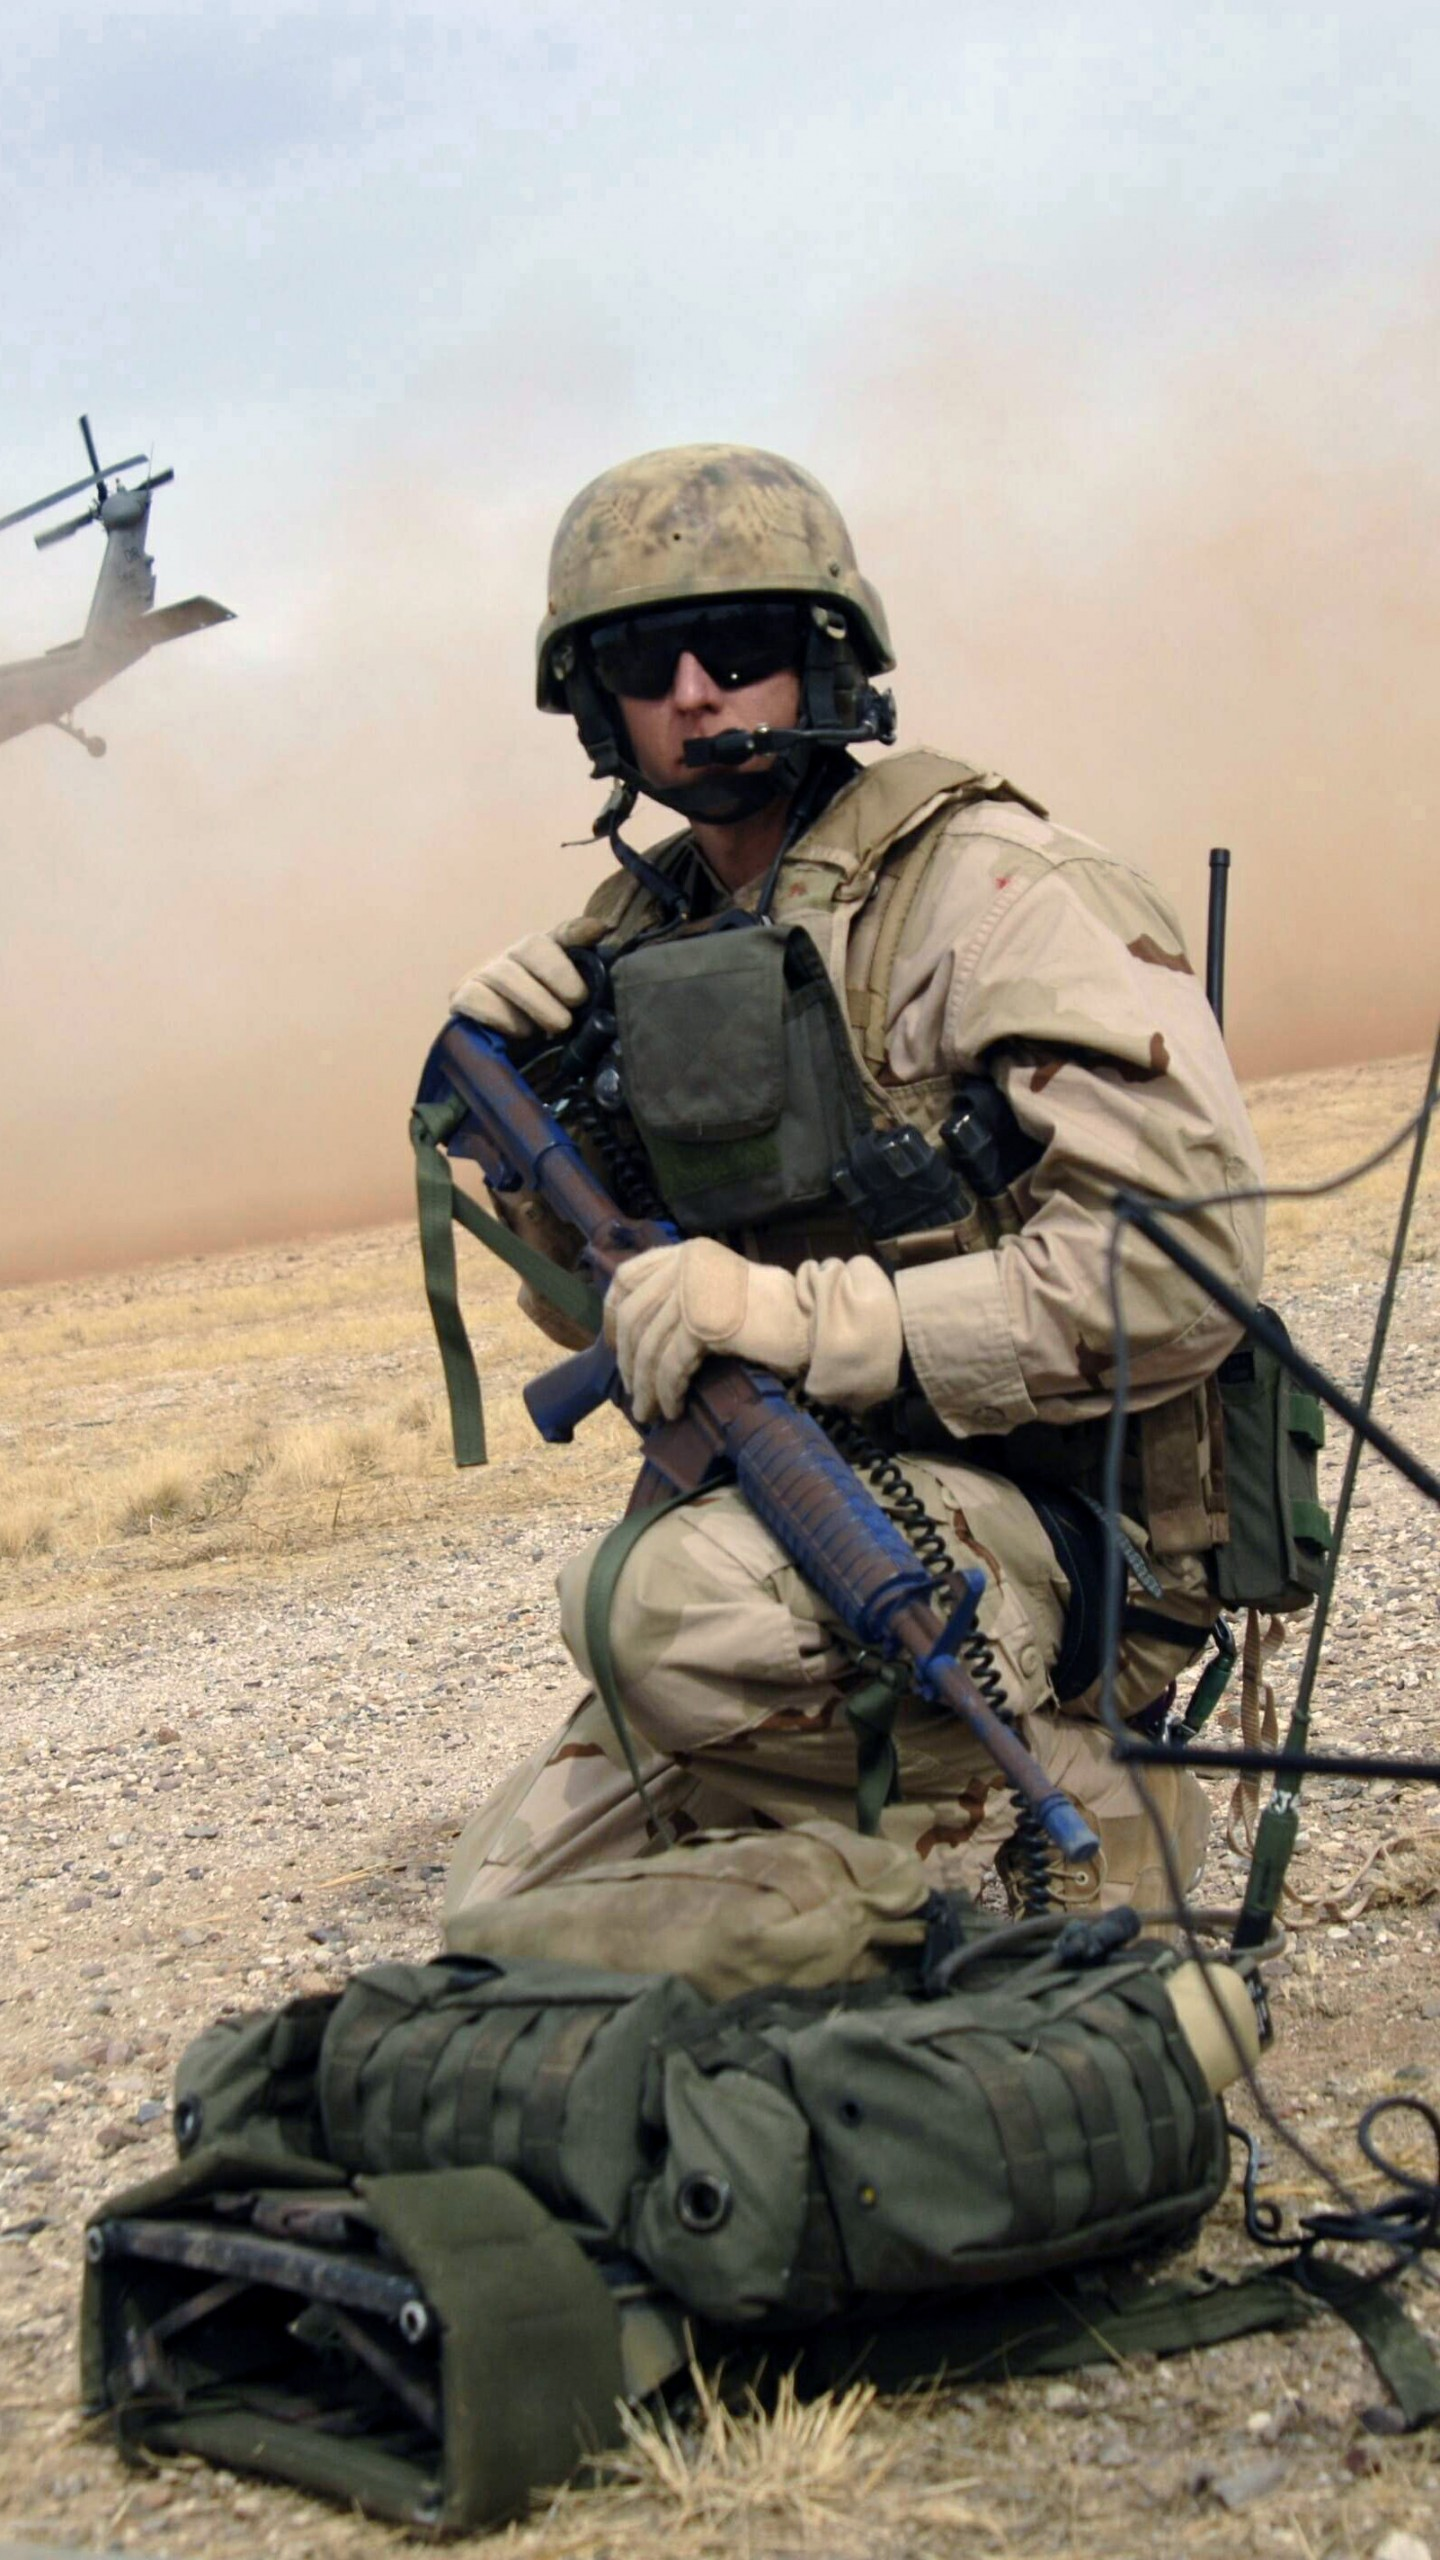 Pilot Super Sport >> Wallpaper U.S. Air Force, soldier, assault rifle, rescue ...